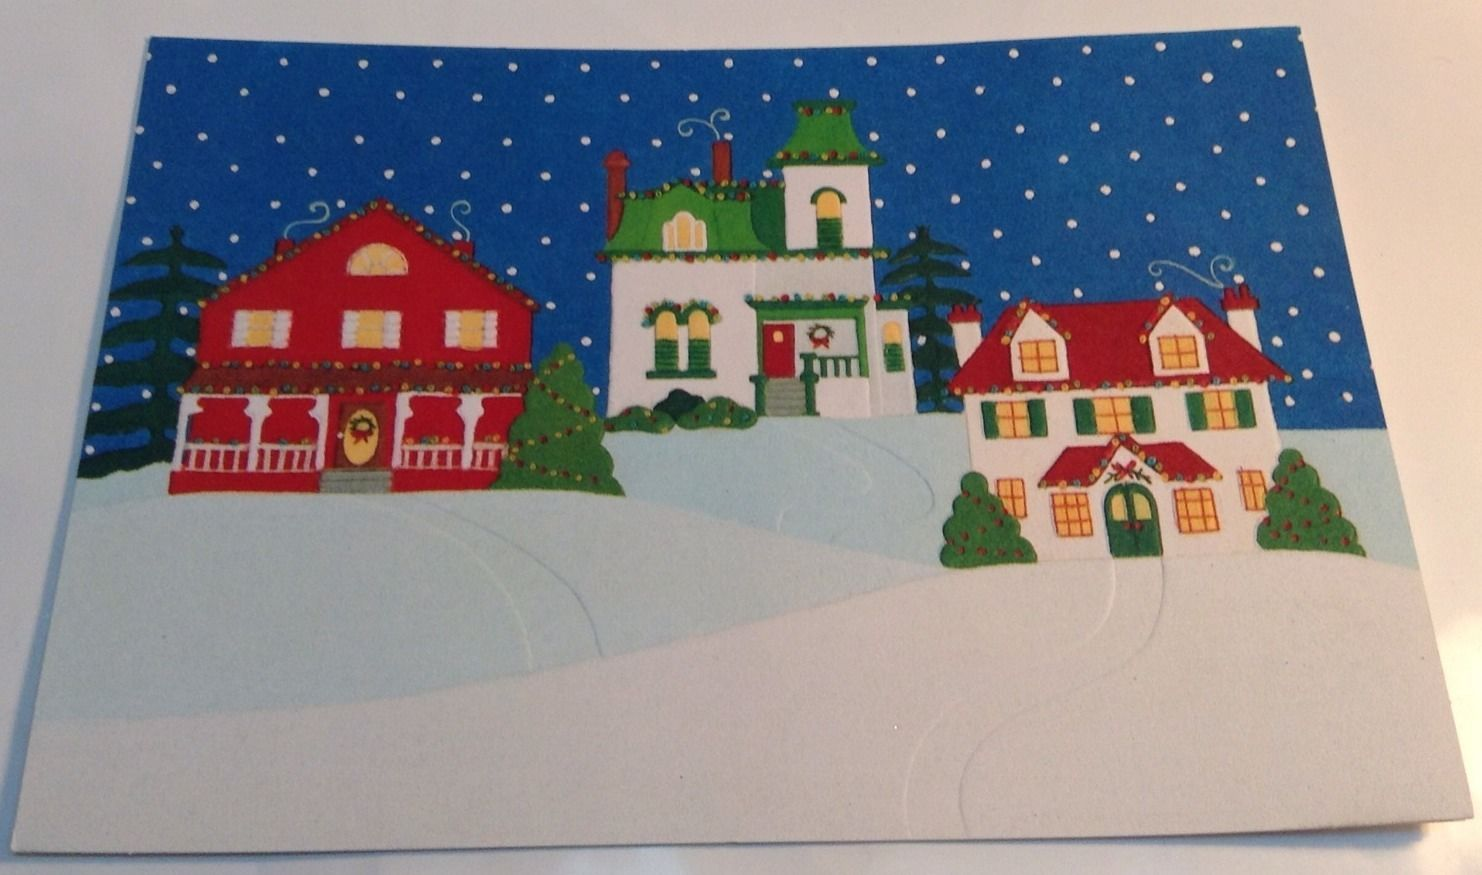 Vintage Hallmark Christmas Greetings Cards And Similar Items